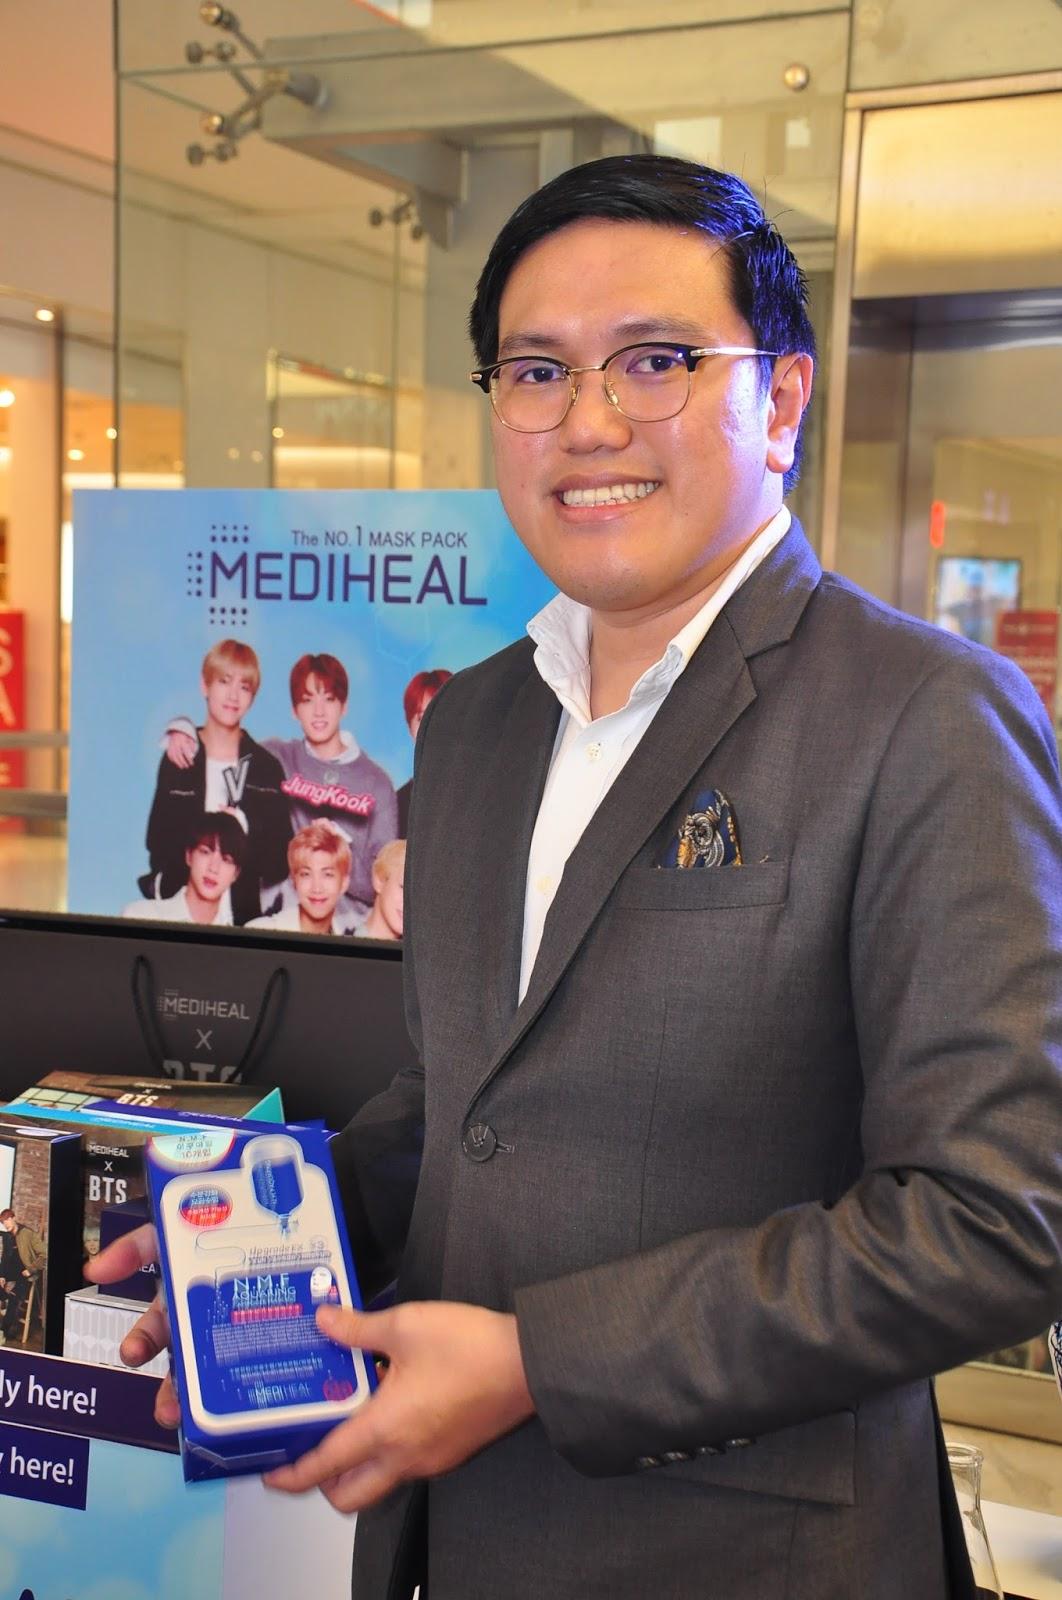 The Global No1 Mediheal Mask Packs That Dominated Koreas Drugstore K Pop Power Bank Exo Bts Bangtan Boys 5000mha Jared De Guzman Watsons Group Category Manager